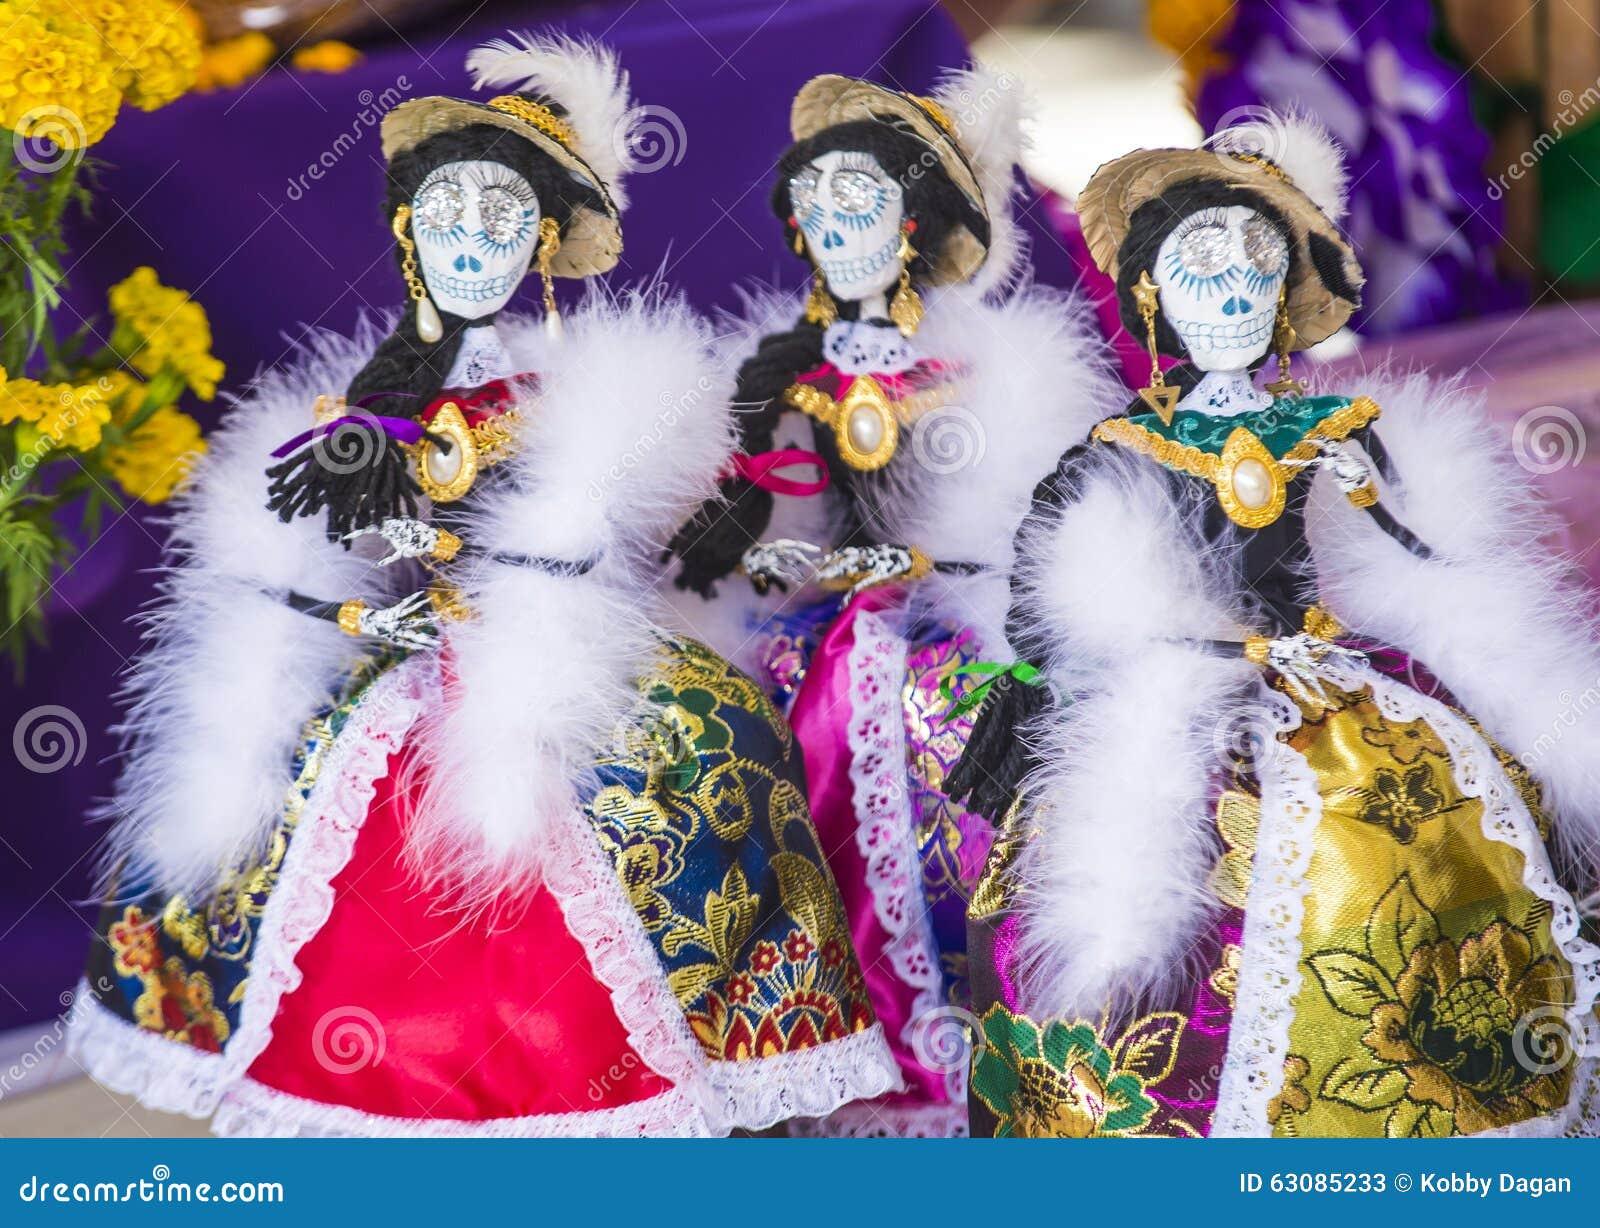 Download Dia de Los Muertos photo stock éditorial. Image du mort - 63085233